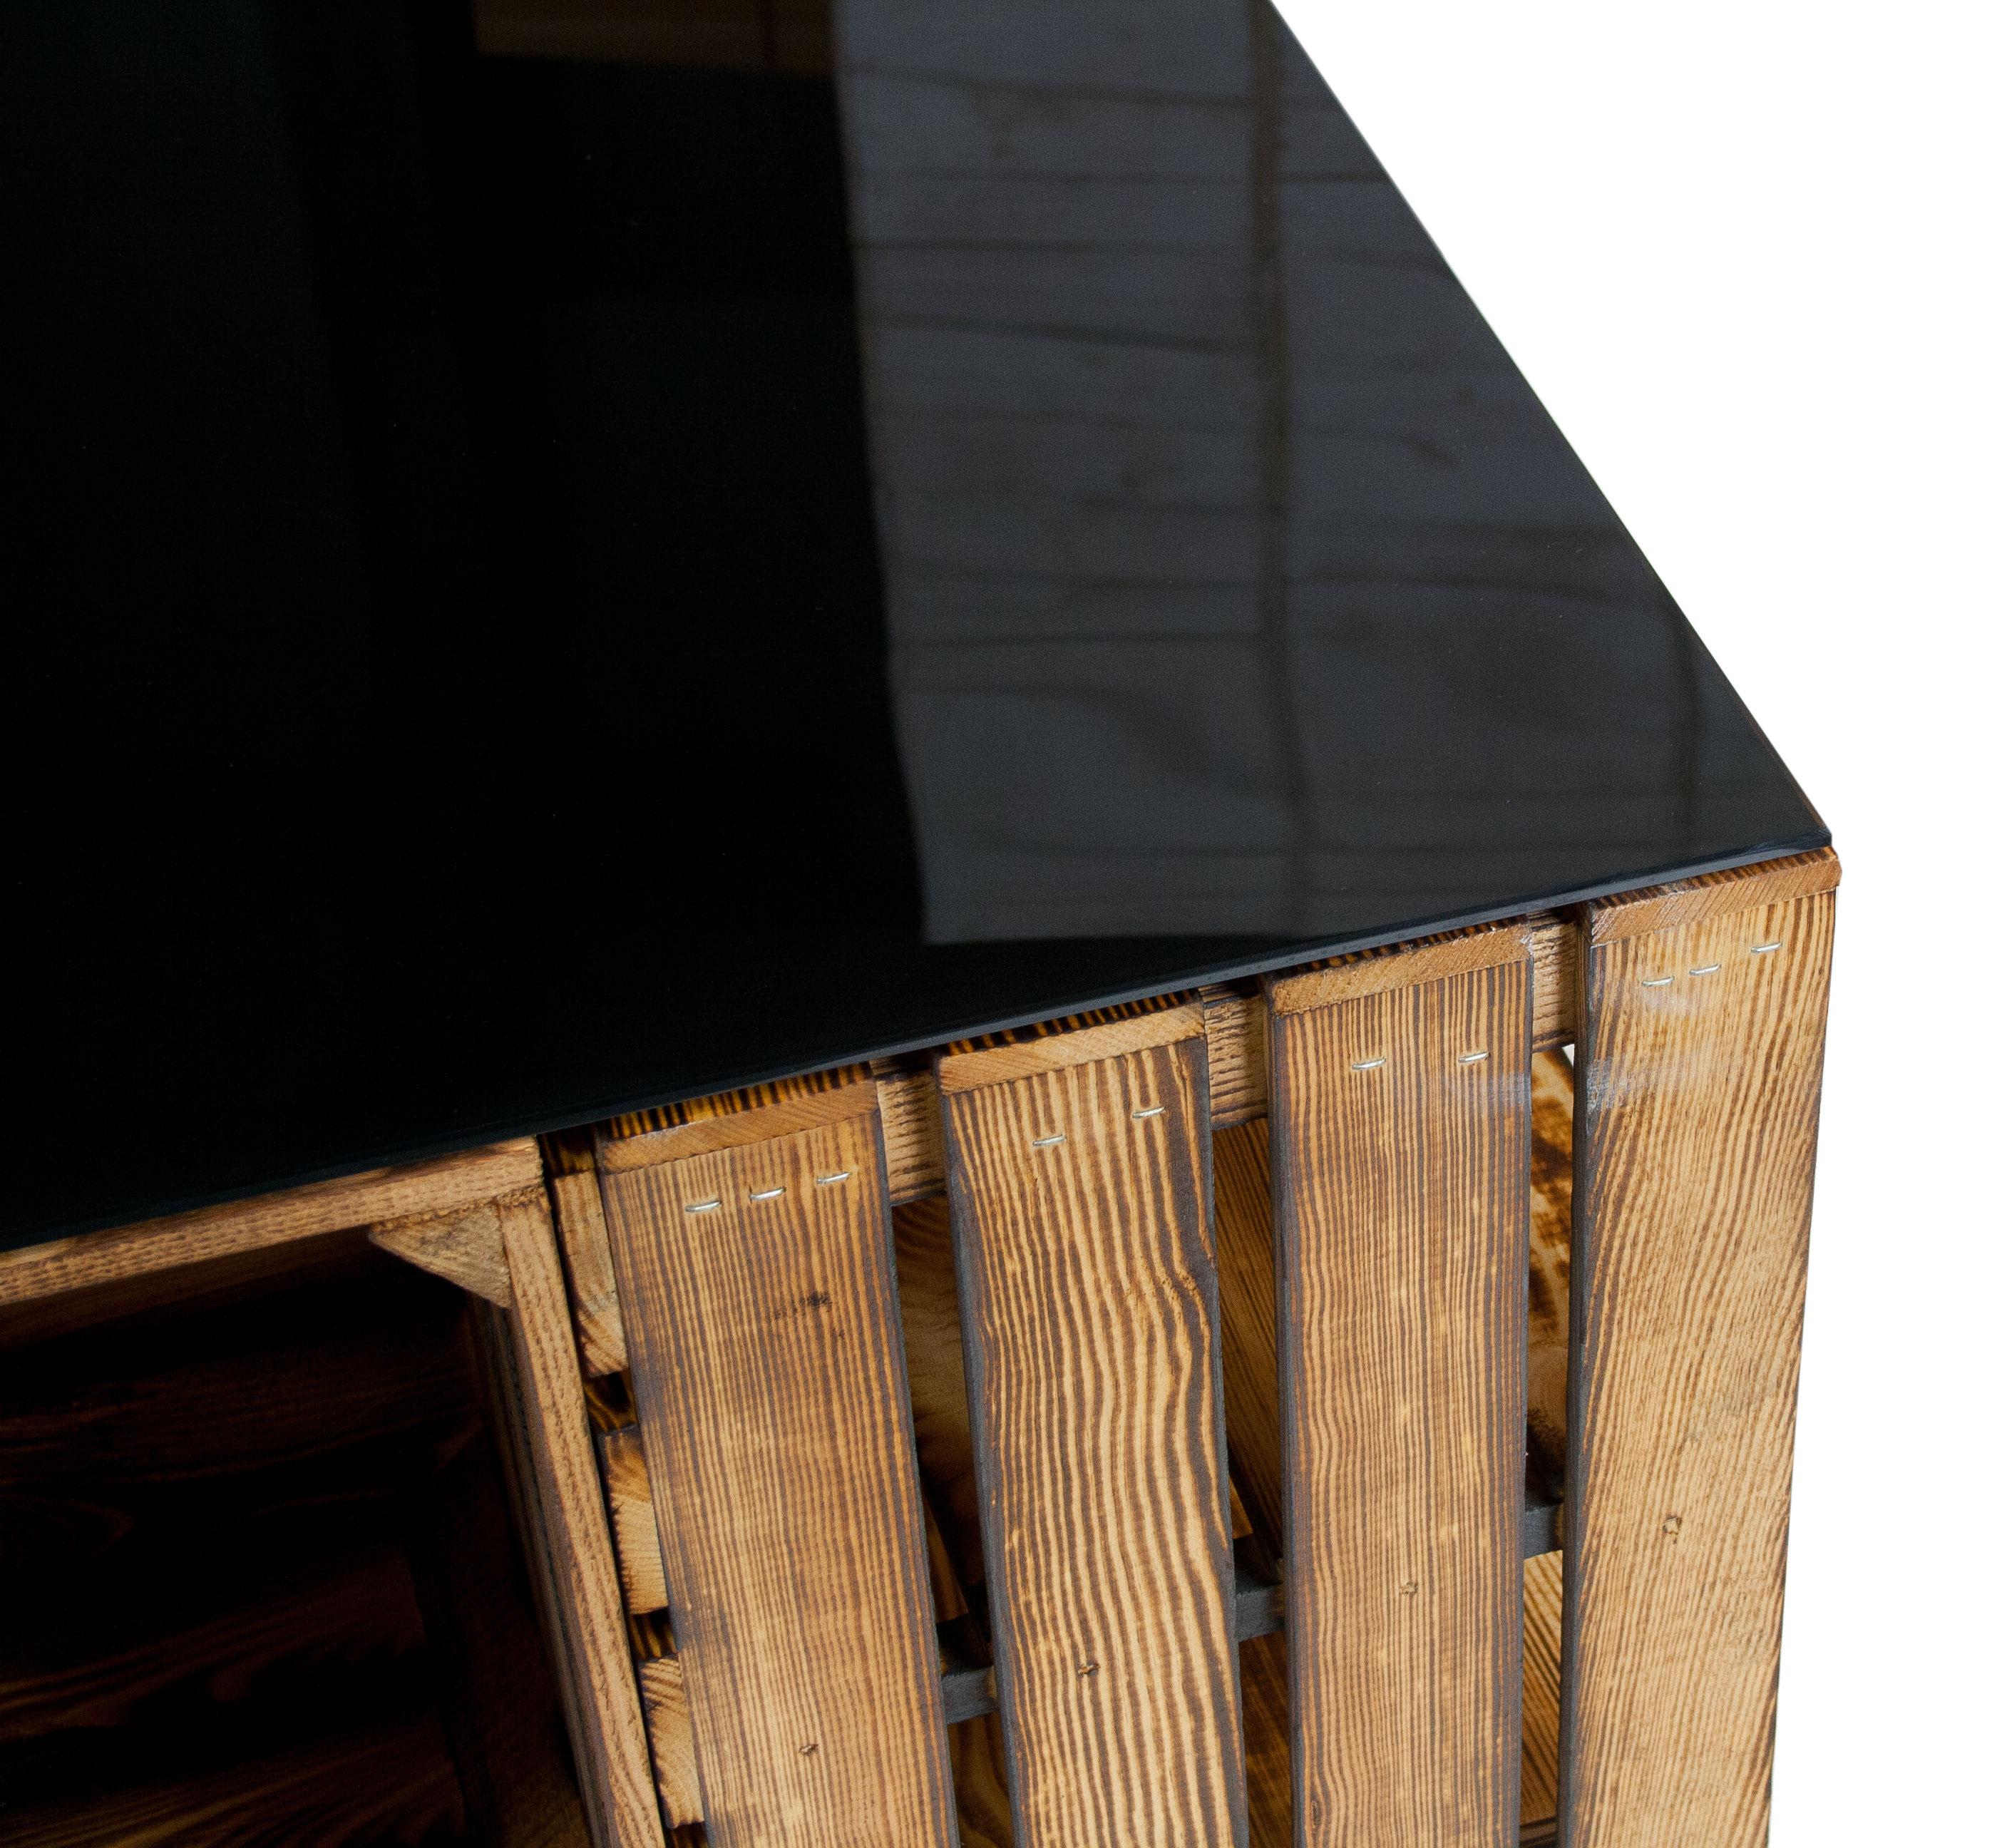 geflammter couchtisch aus apfelkisten mit rollen inkl. Black Bedroom Furniture Sets. Home Design Ideas